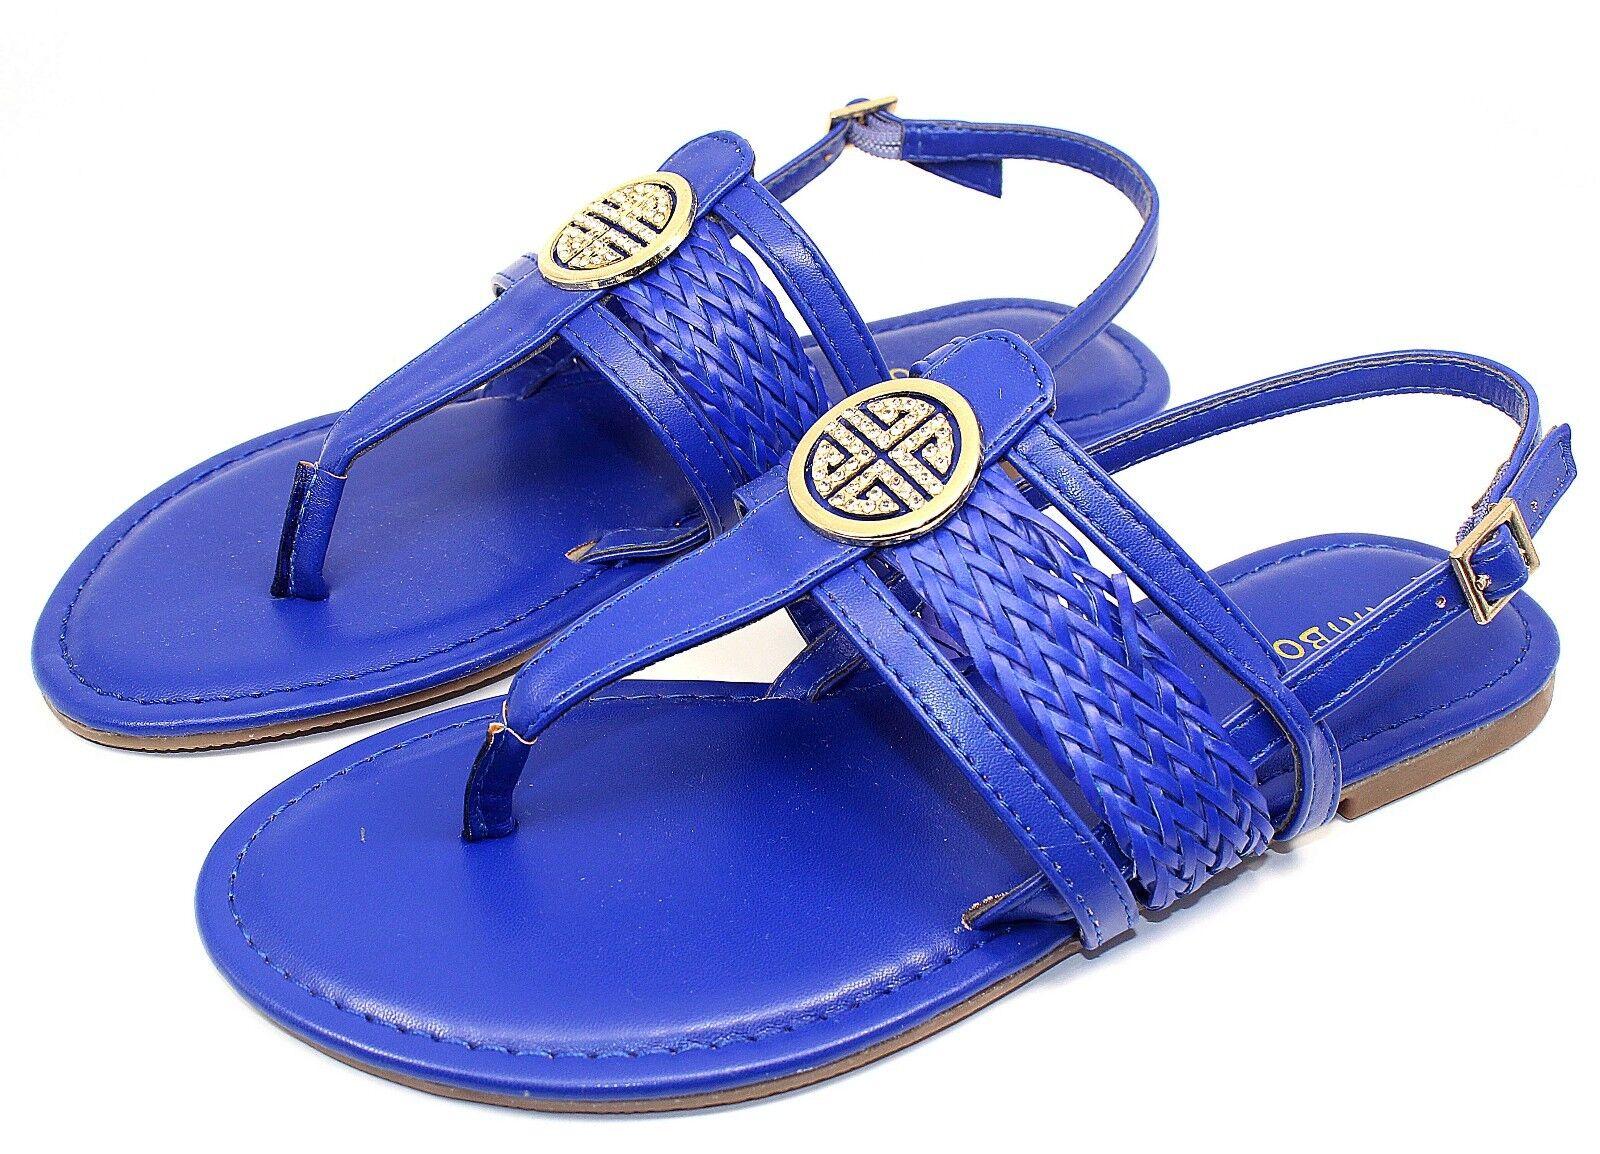 Nadya-15 Blink Gladiator Shoes Buckles Flat Cute Comfort Sandals Women Shoes Gladiator Blue 6 1607cc